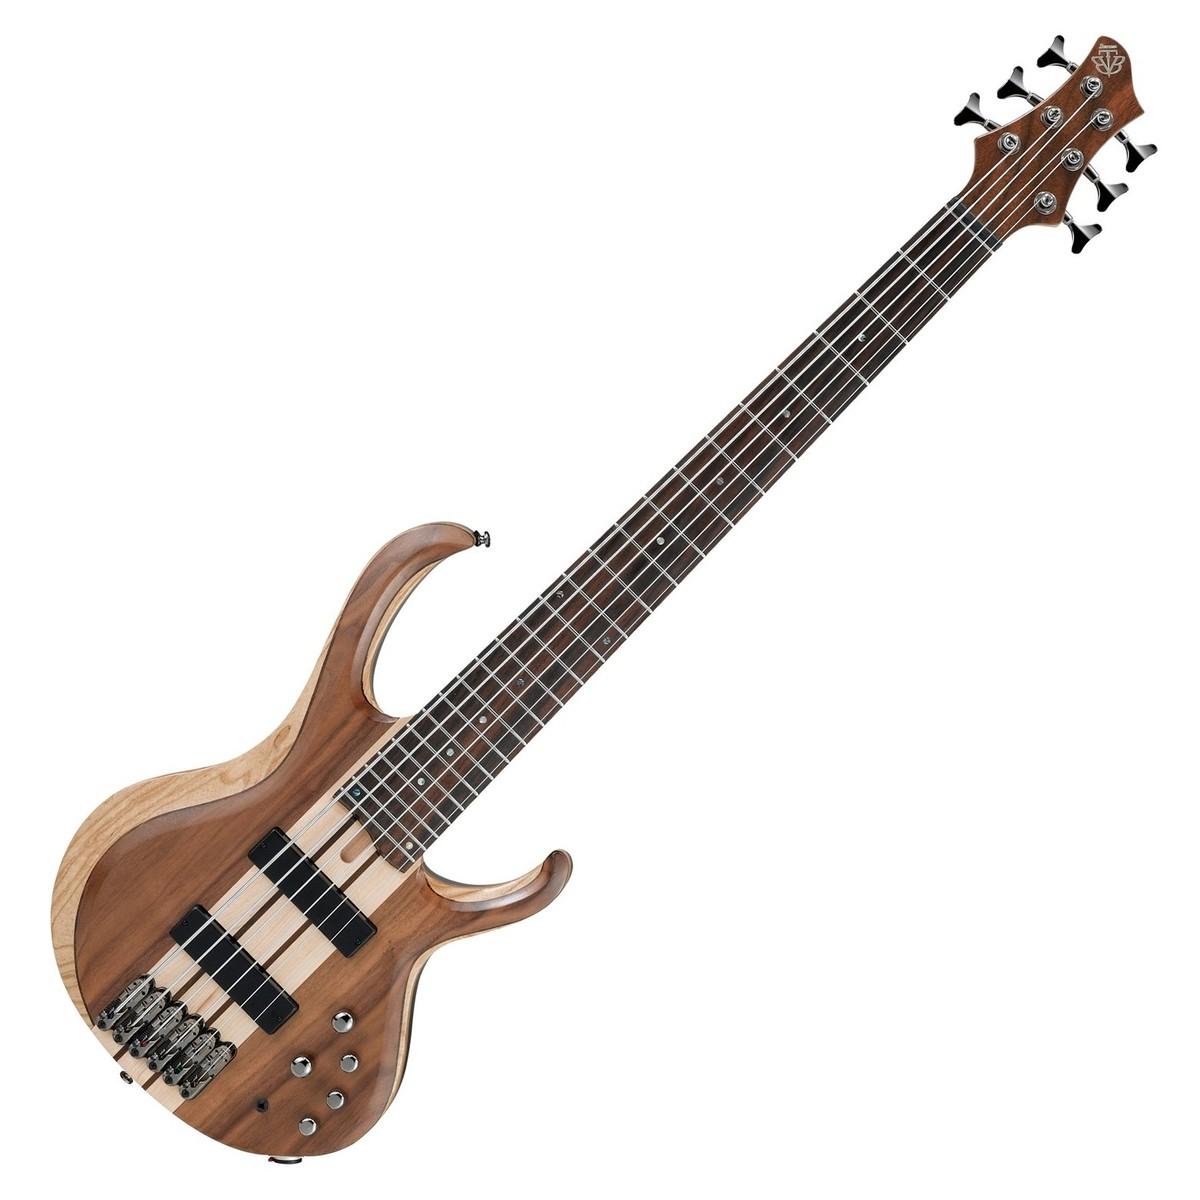 ibanez btb746 6 string bass guitar natural low gloss at. Black Bedroom Furniture Sets. Home Design Ideas